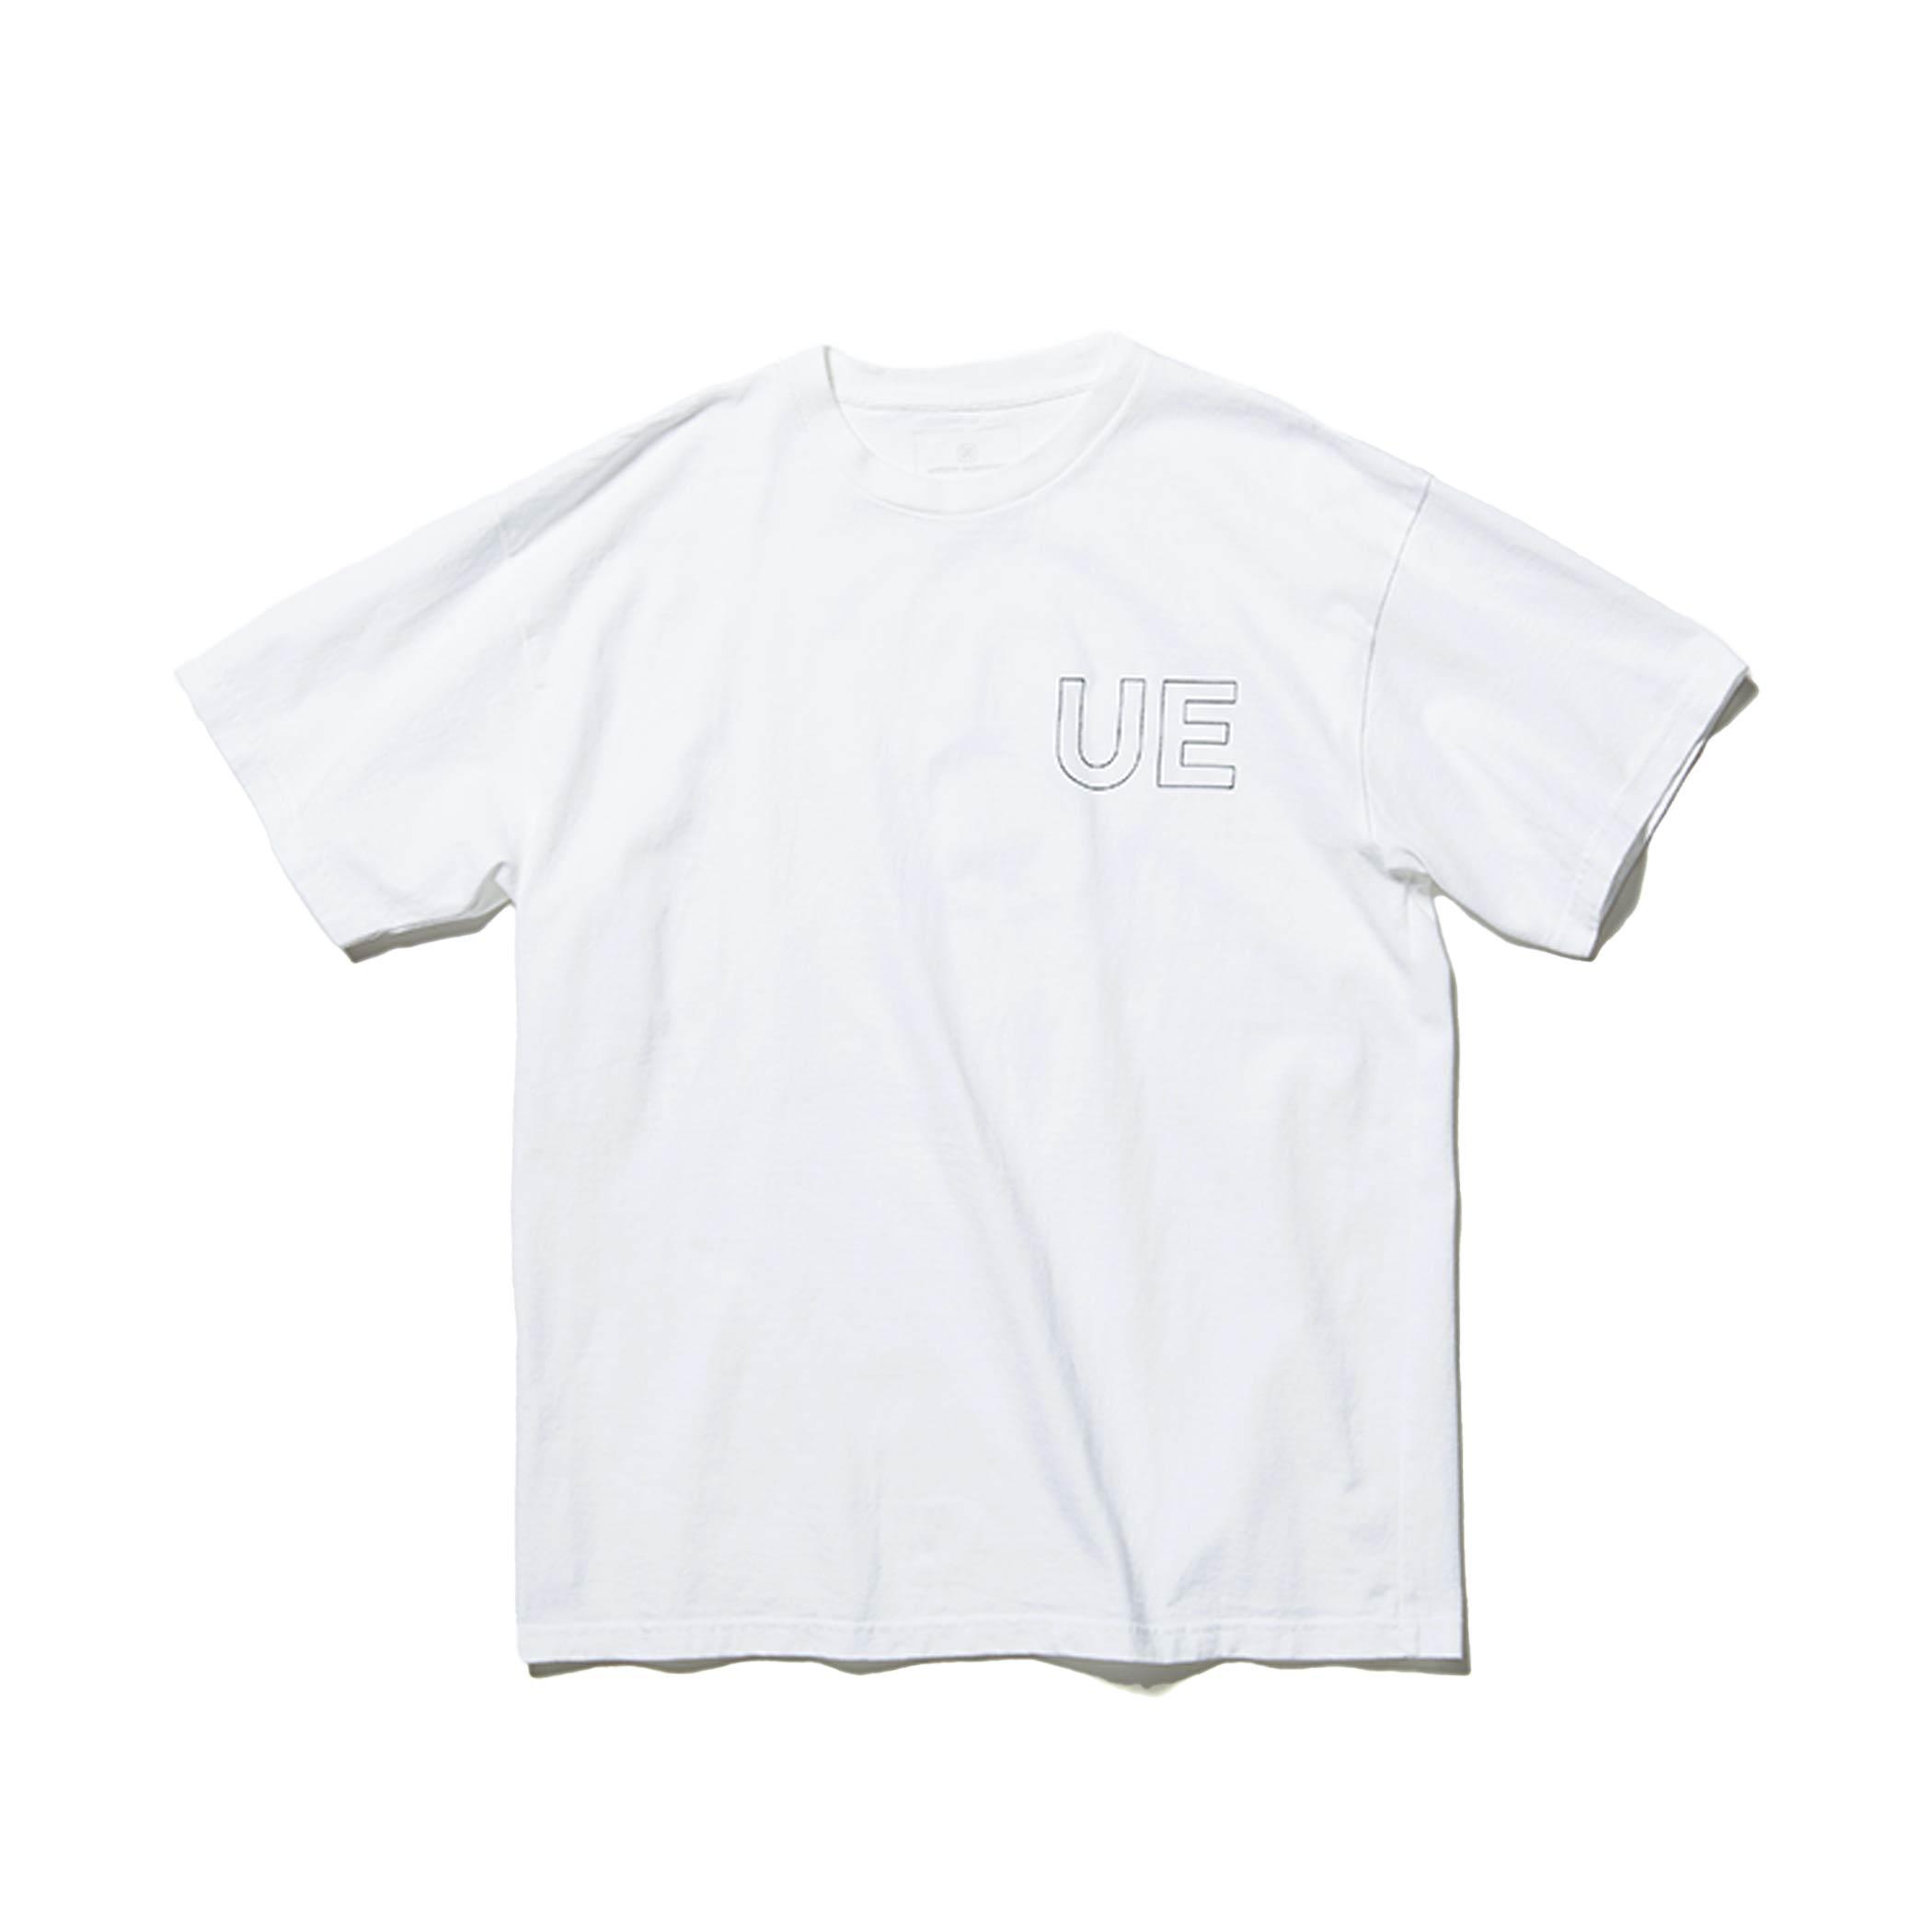 uniform experiment / OUTLINE LOGO TEE (Black)